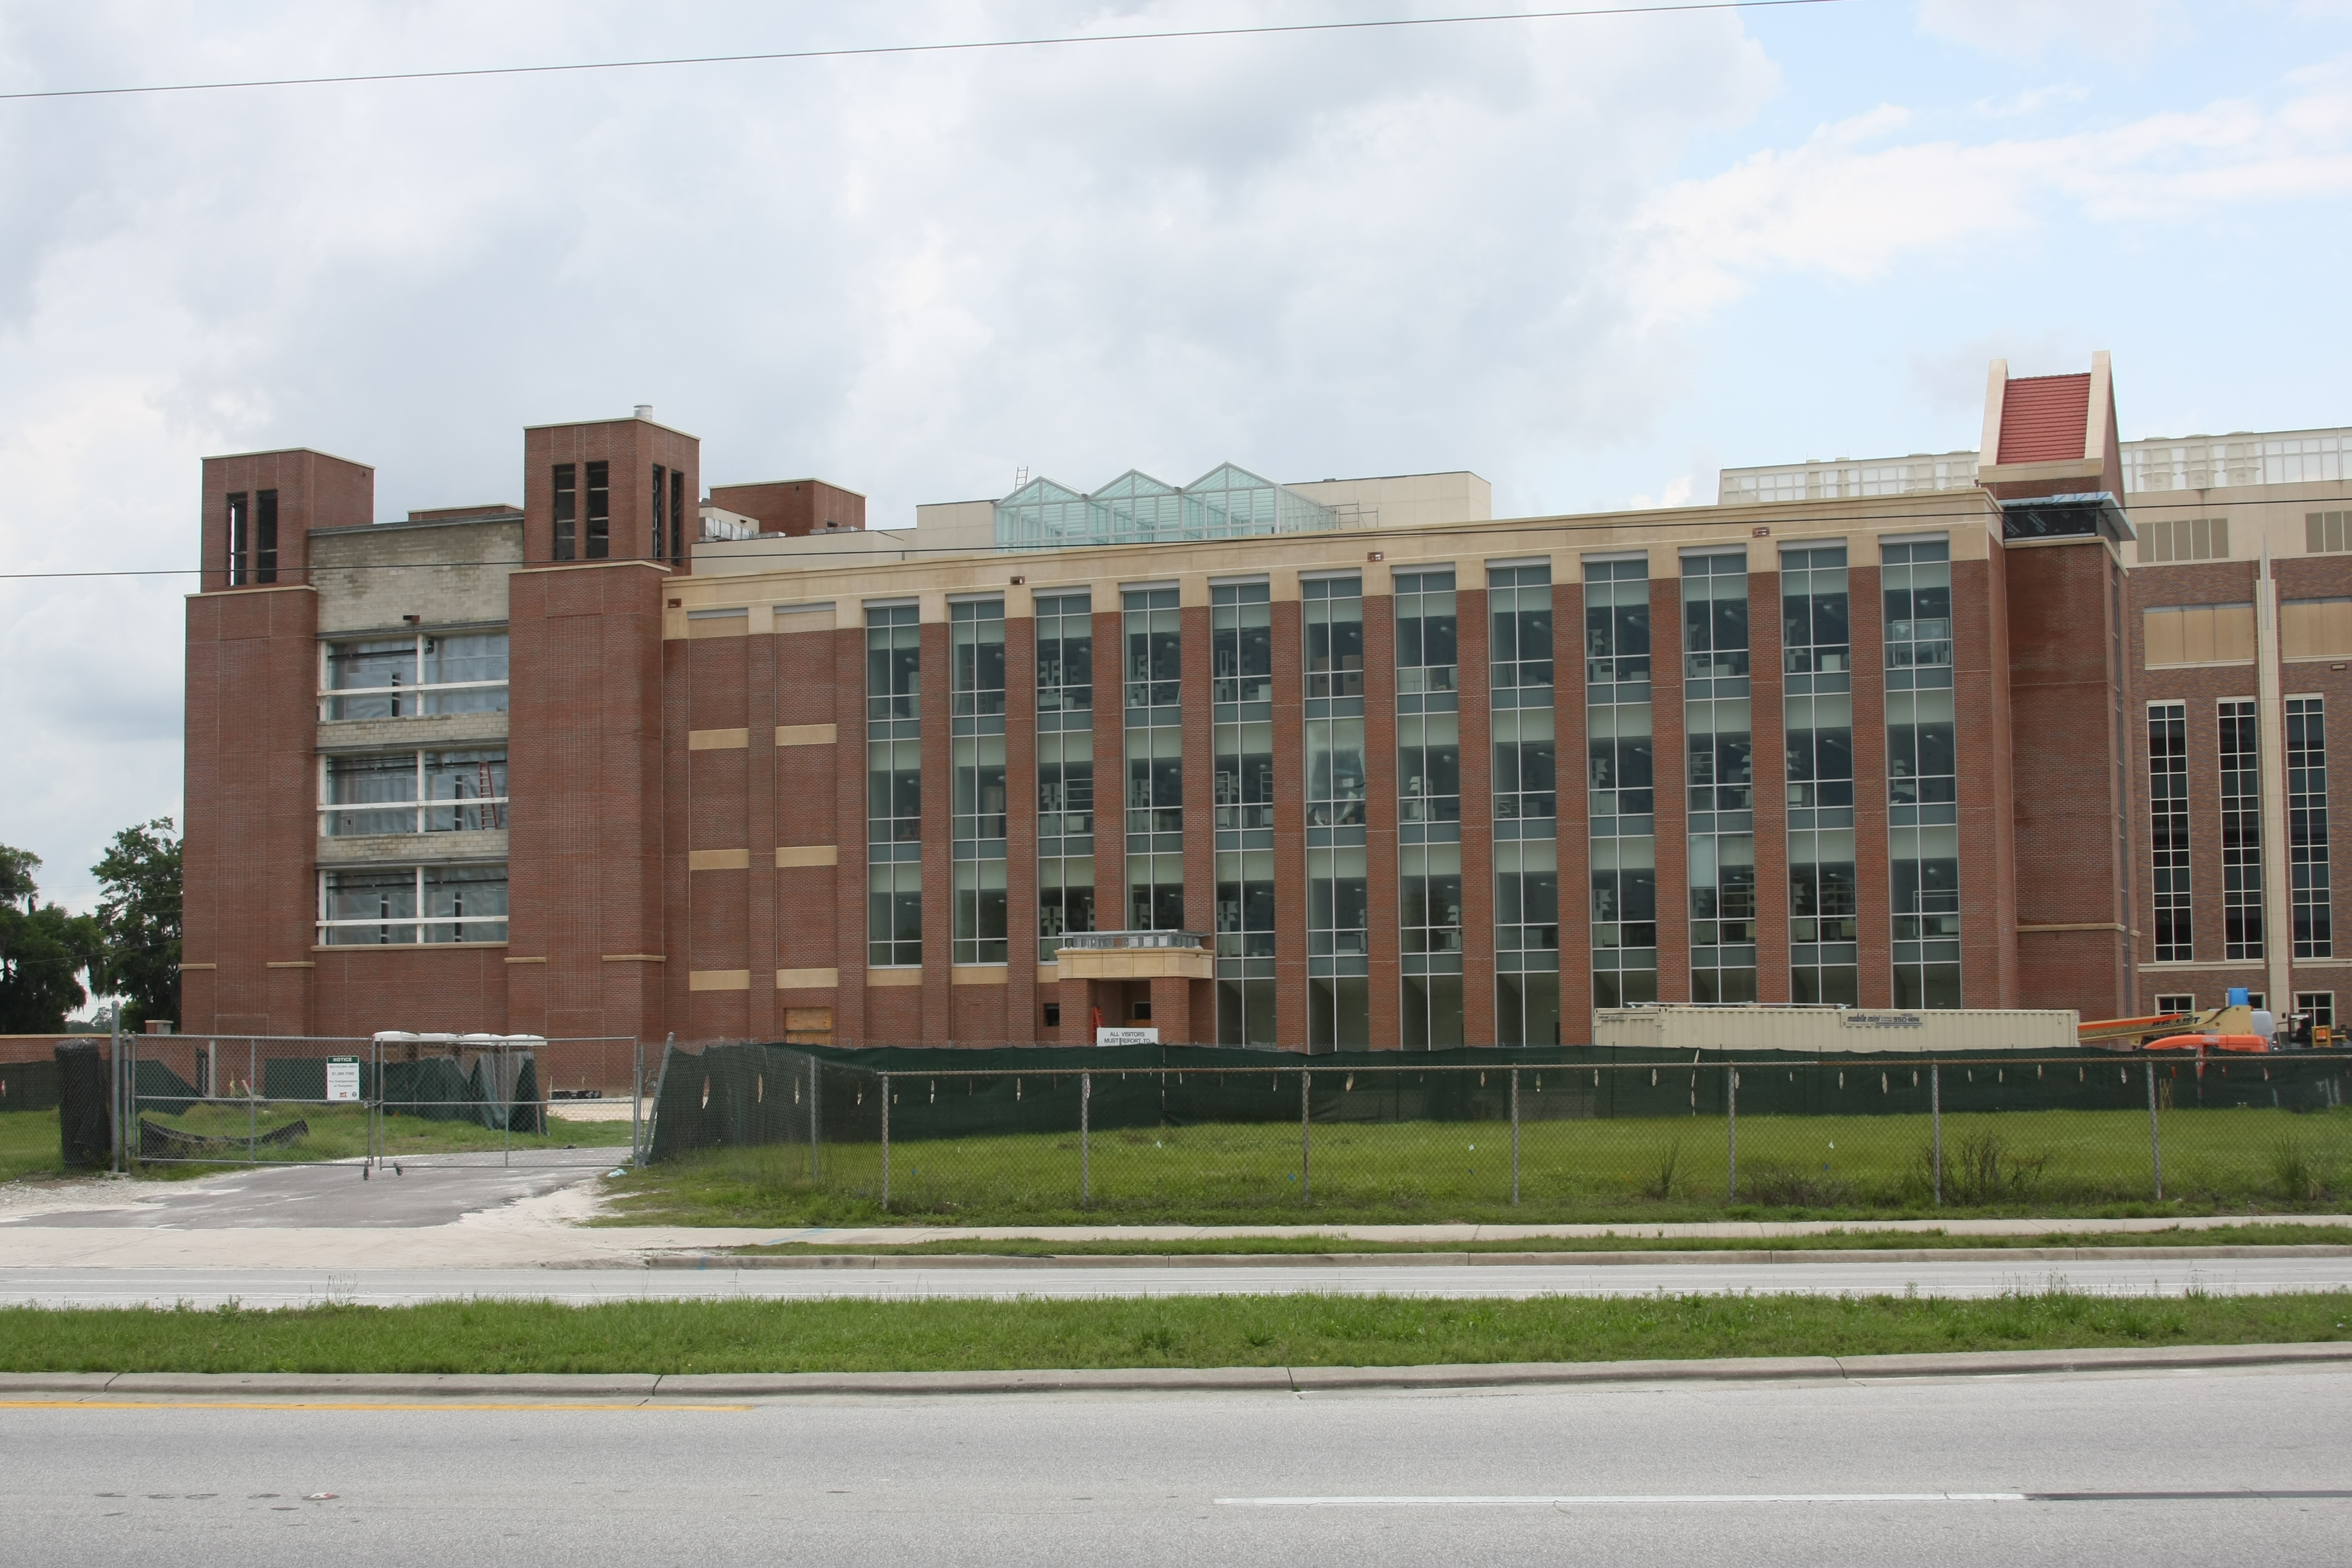 File:UF KeysResidentialComplex.jpg - Wikimedia Commons